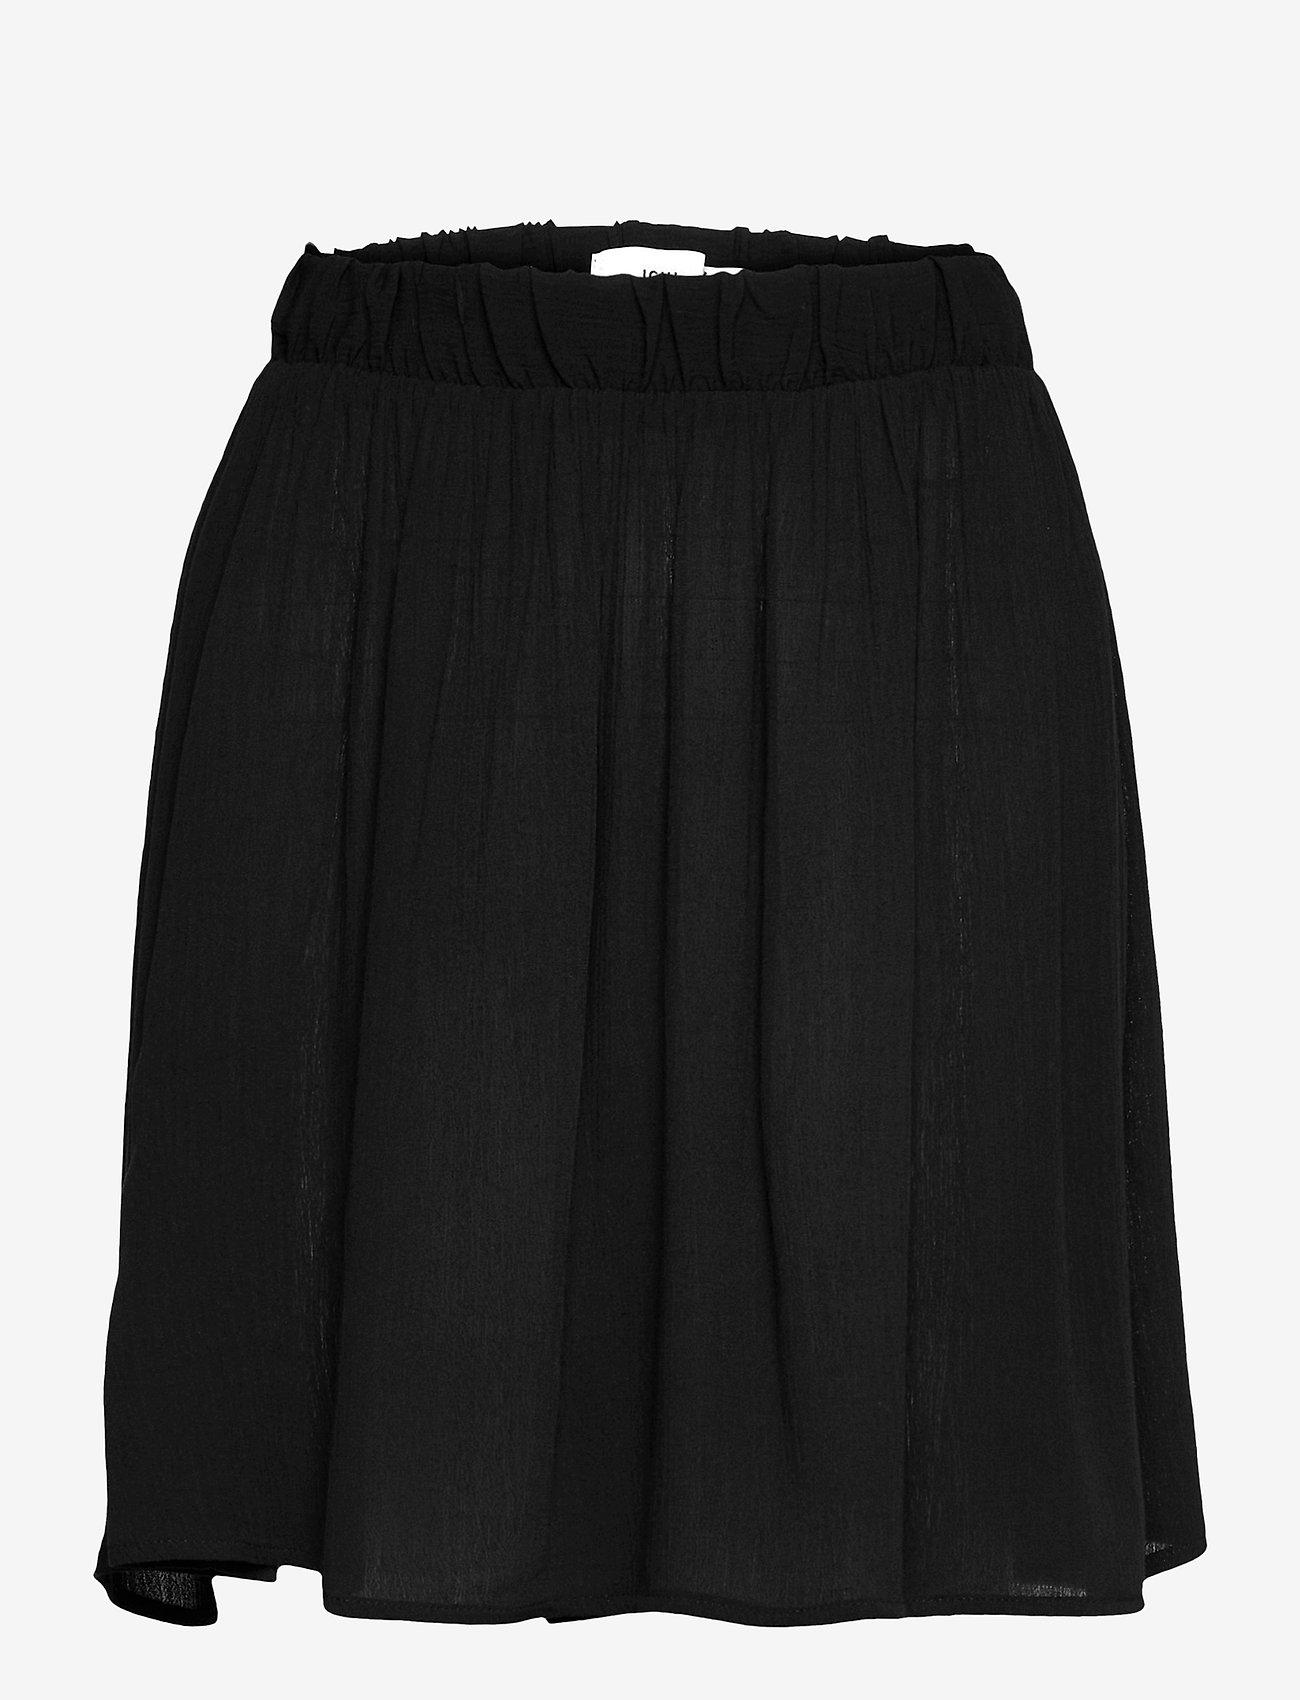 ICHI - IHMARRAKECH SO SK - short skirts - black - 0